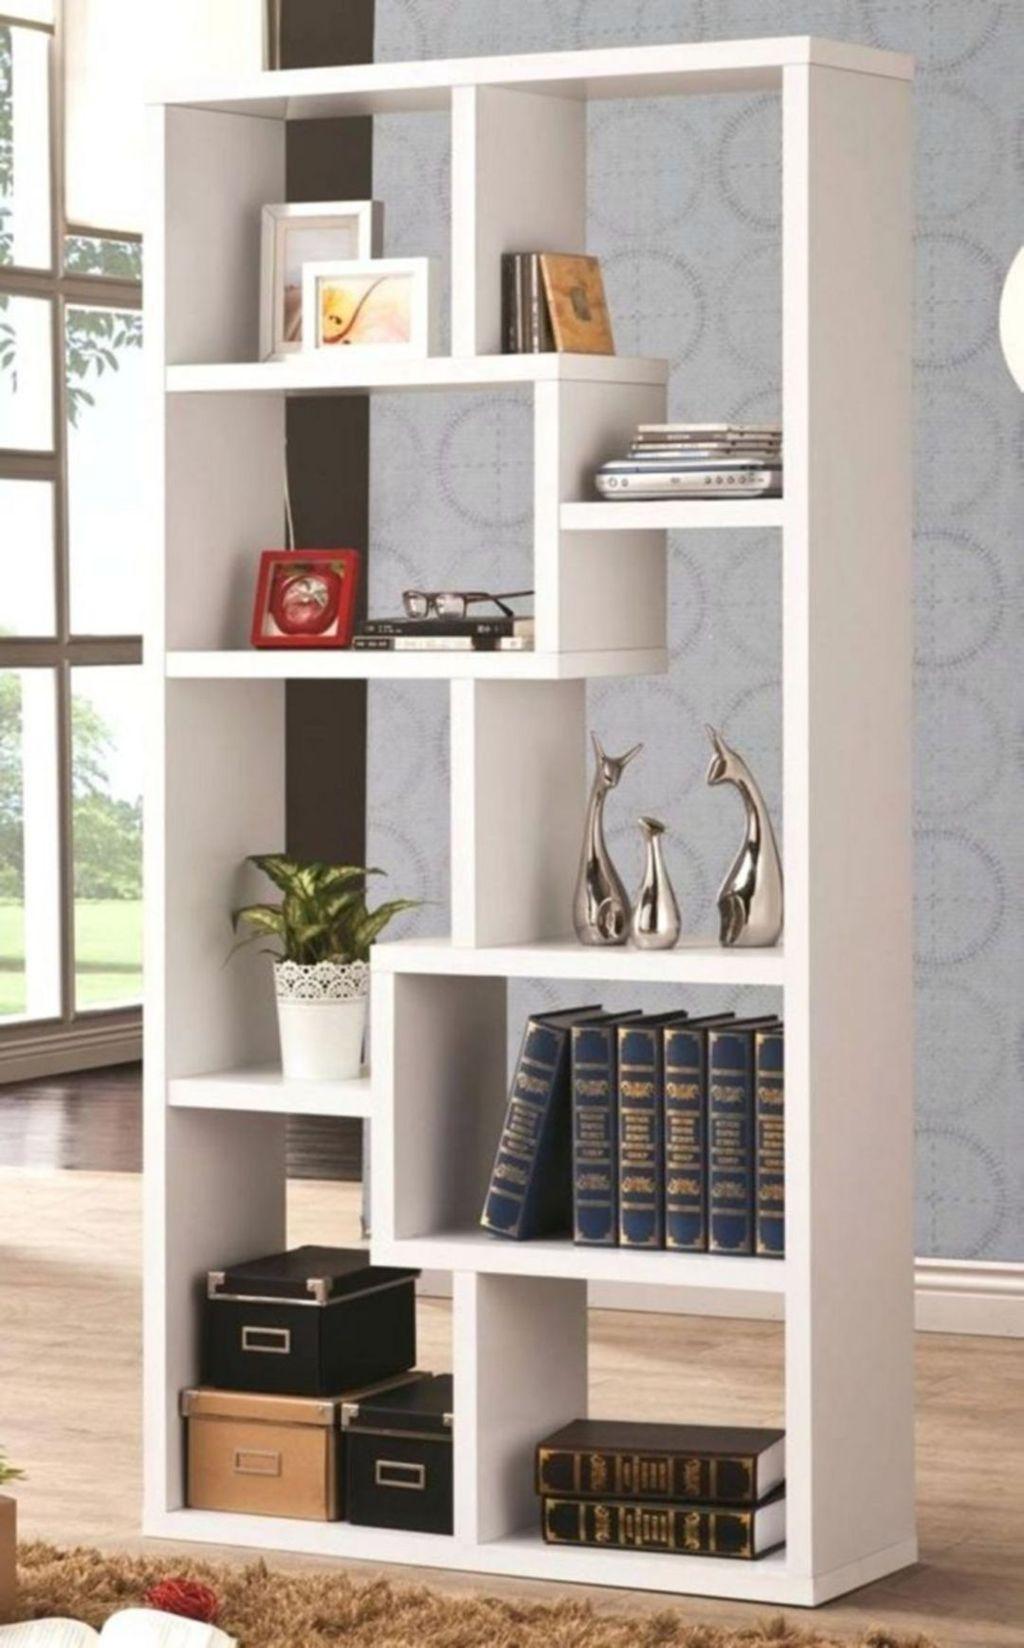 Fabulous Bookshelf Design Ideas For Your Interior Decor 08